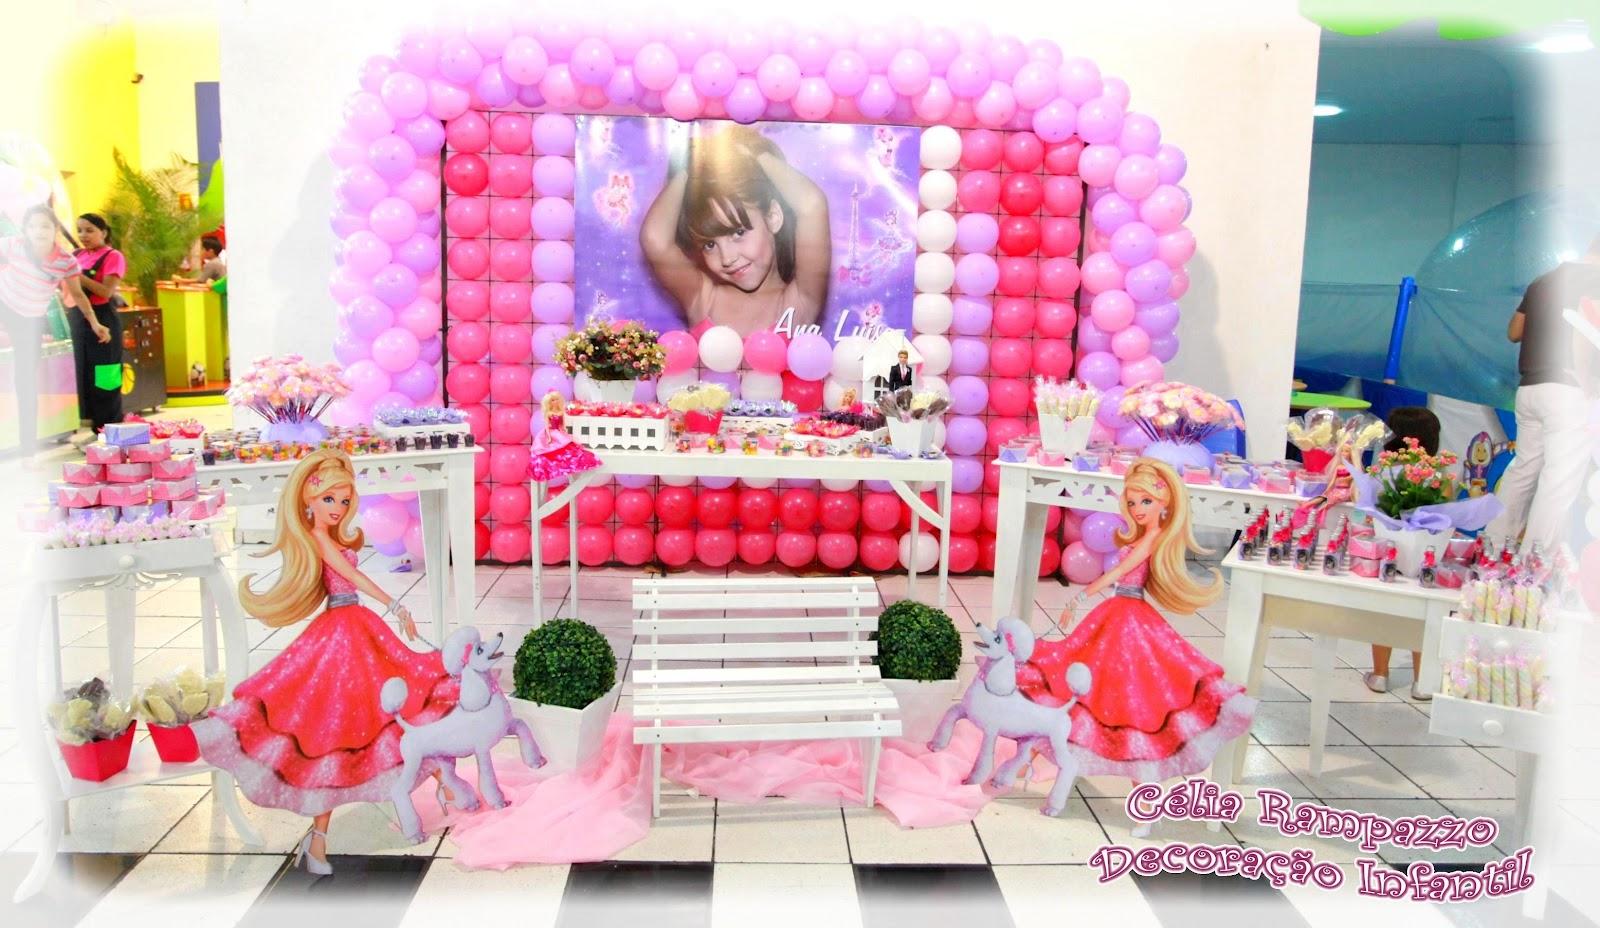 decoracao festa barbie : decoracao festa barbie:Festa: Barbie Moda e Magia